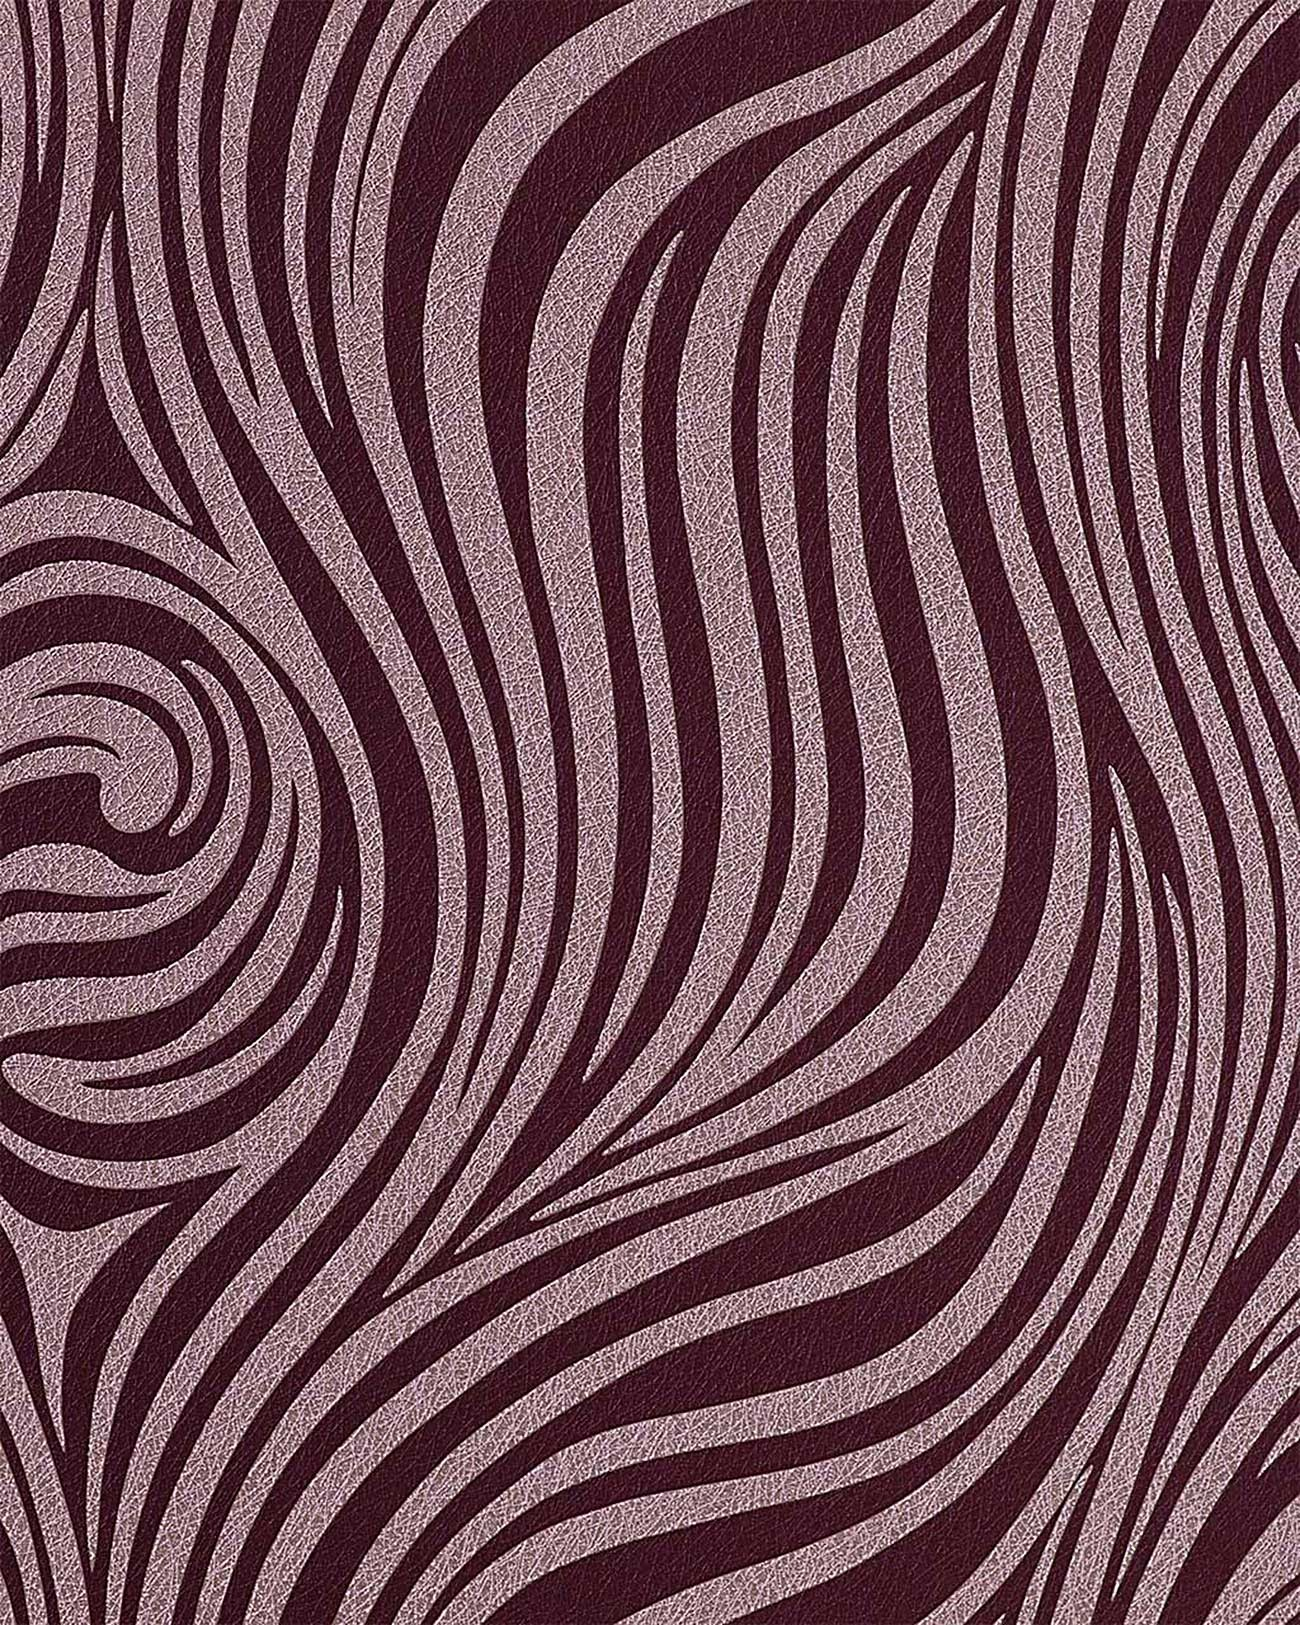 grafik tapete edem 1016 14 zebra streifen tapete. Black Bedroom Furniture Sets. Home Design Ideas